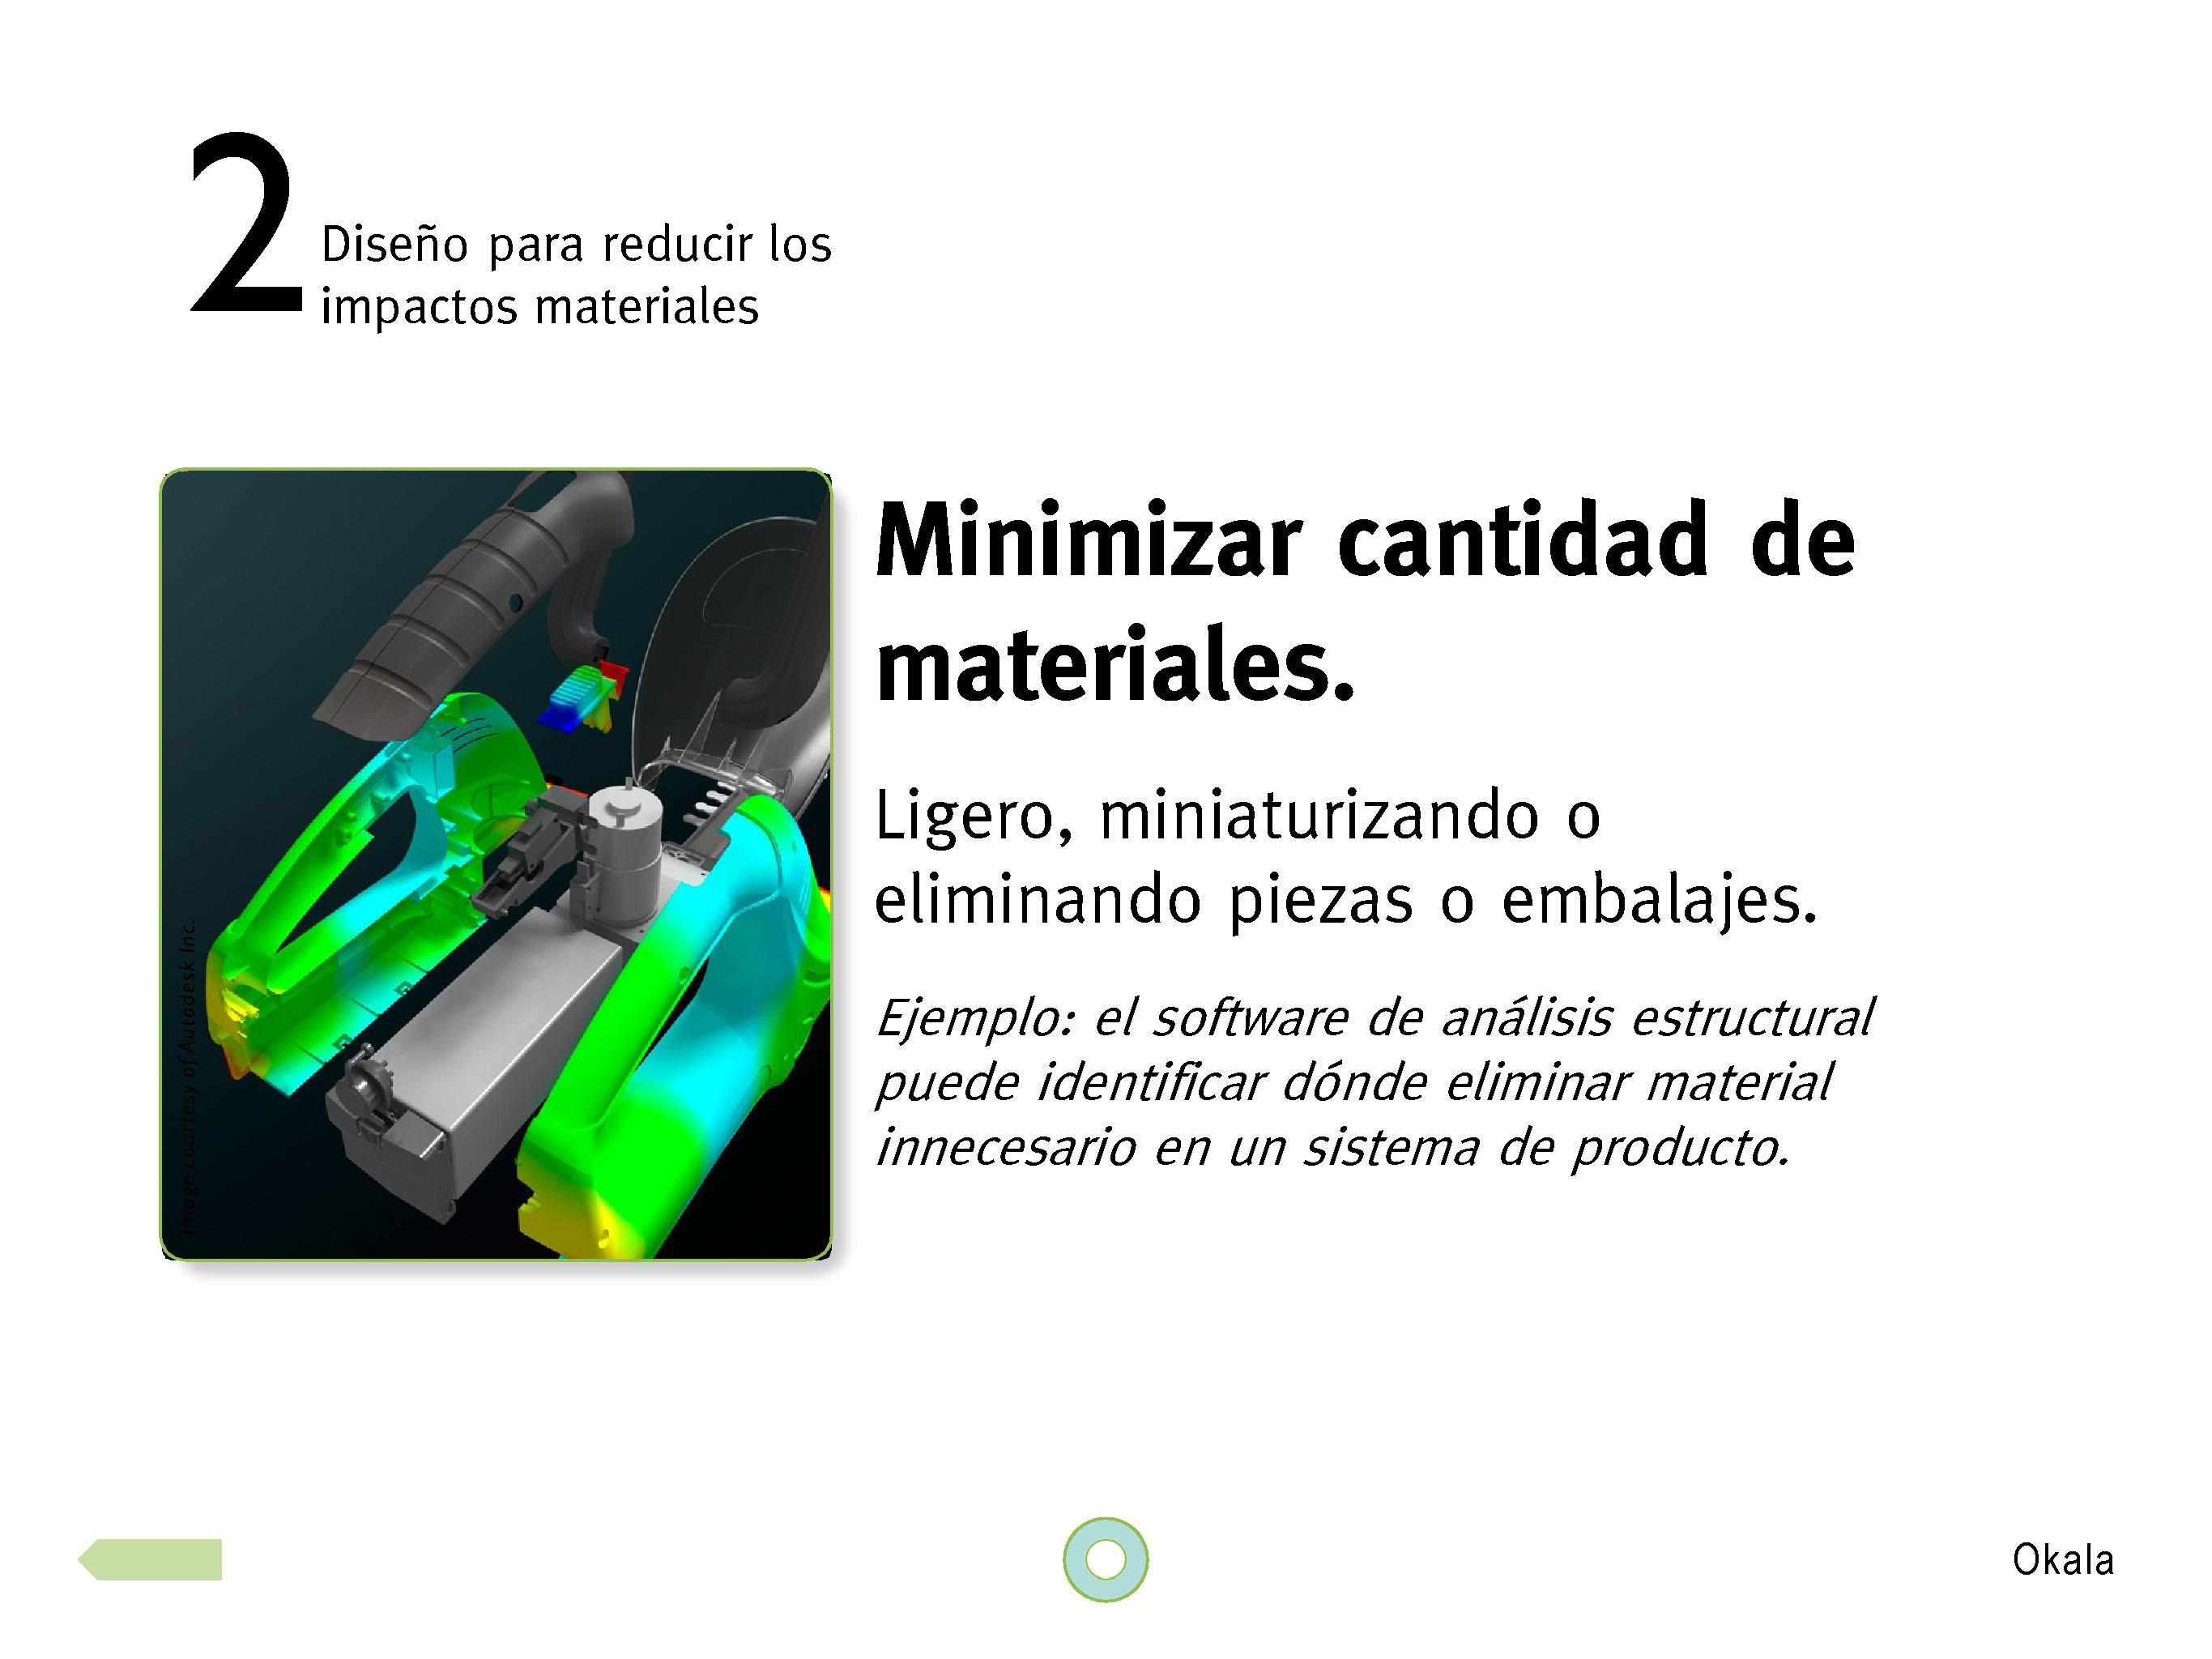 okala-ecodesign-strategy-guide-2012-spanish.new_page_11-1